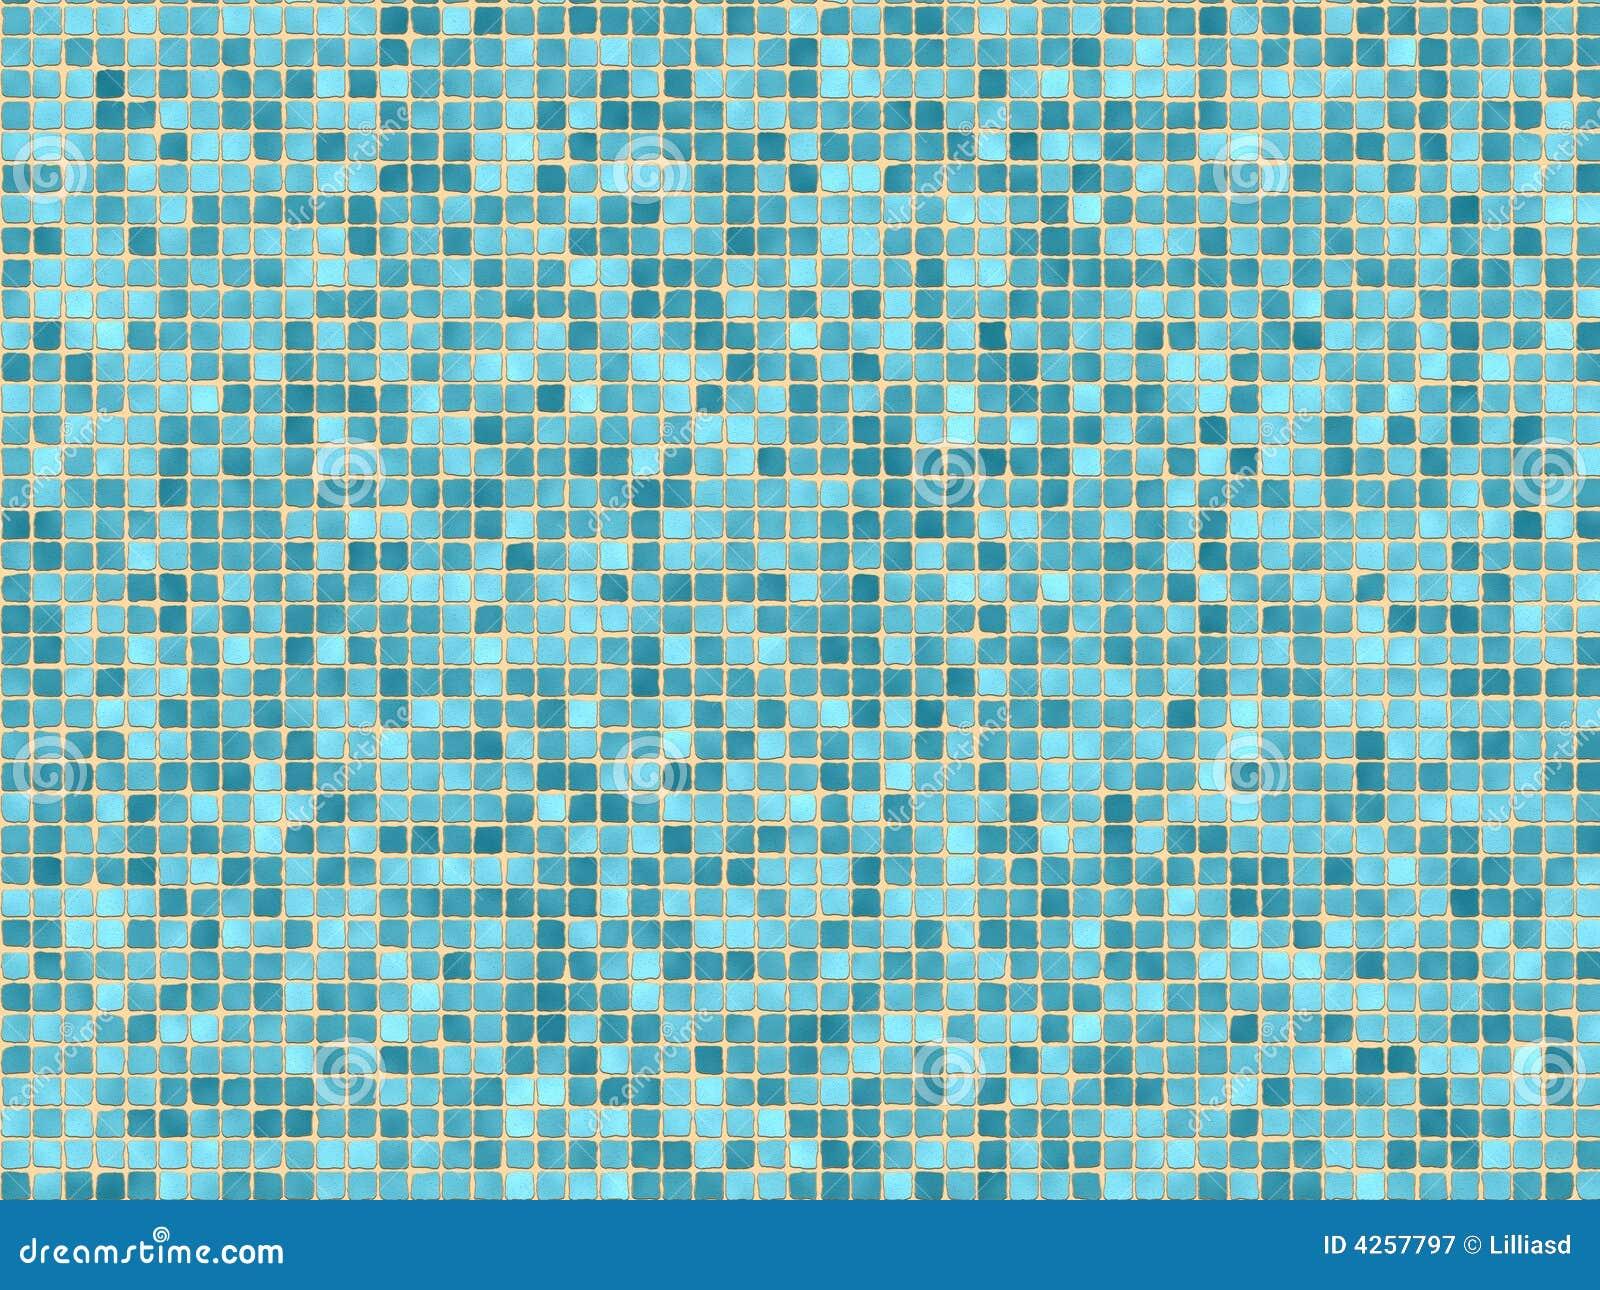 Blaue Mosaikfliesen Lizenzfreie Stockfotografie - Bild ...